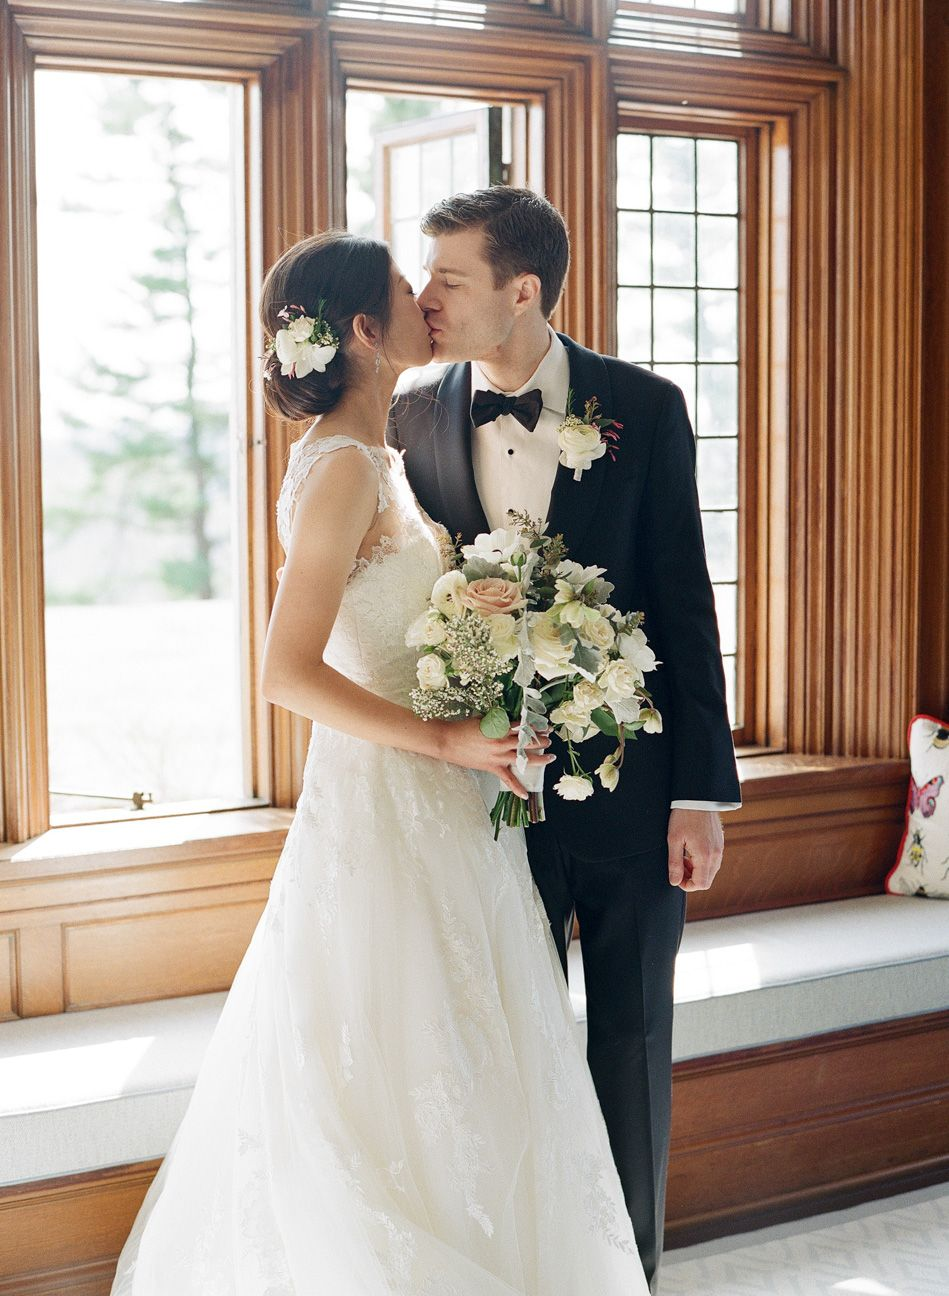 KarenHillPhotography-Zhu-Wedding-0211.jpg